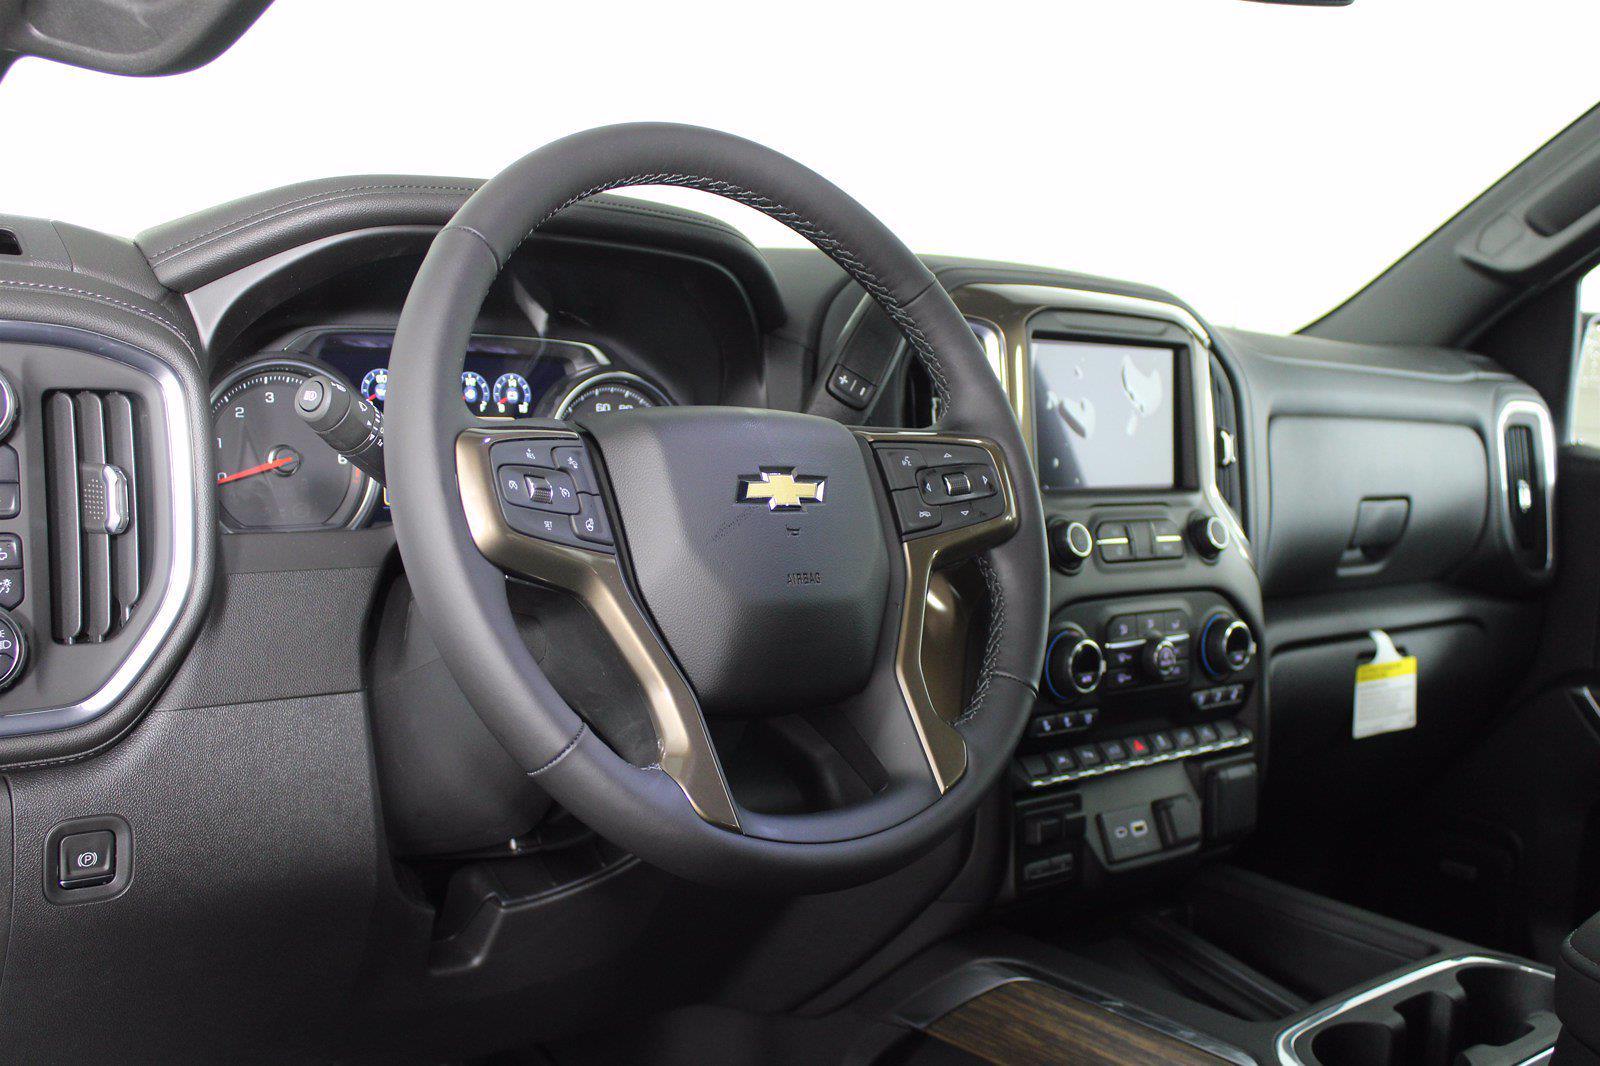 2021 Chevrolet Silverado 1500 Crew Cab 4x4, Pickup #D111072 - photo 10